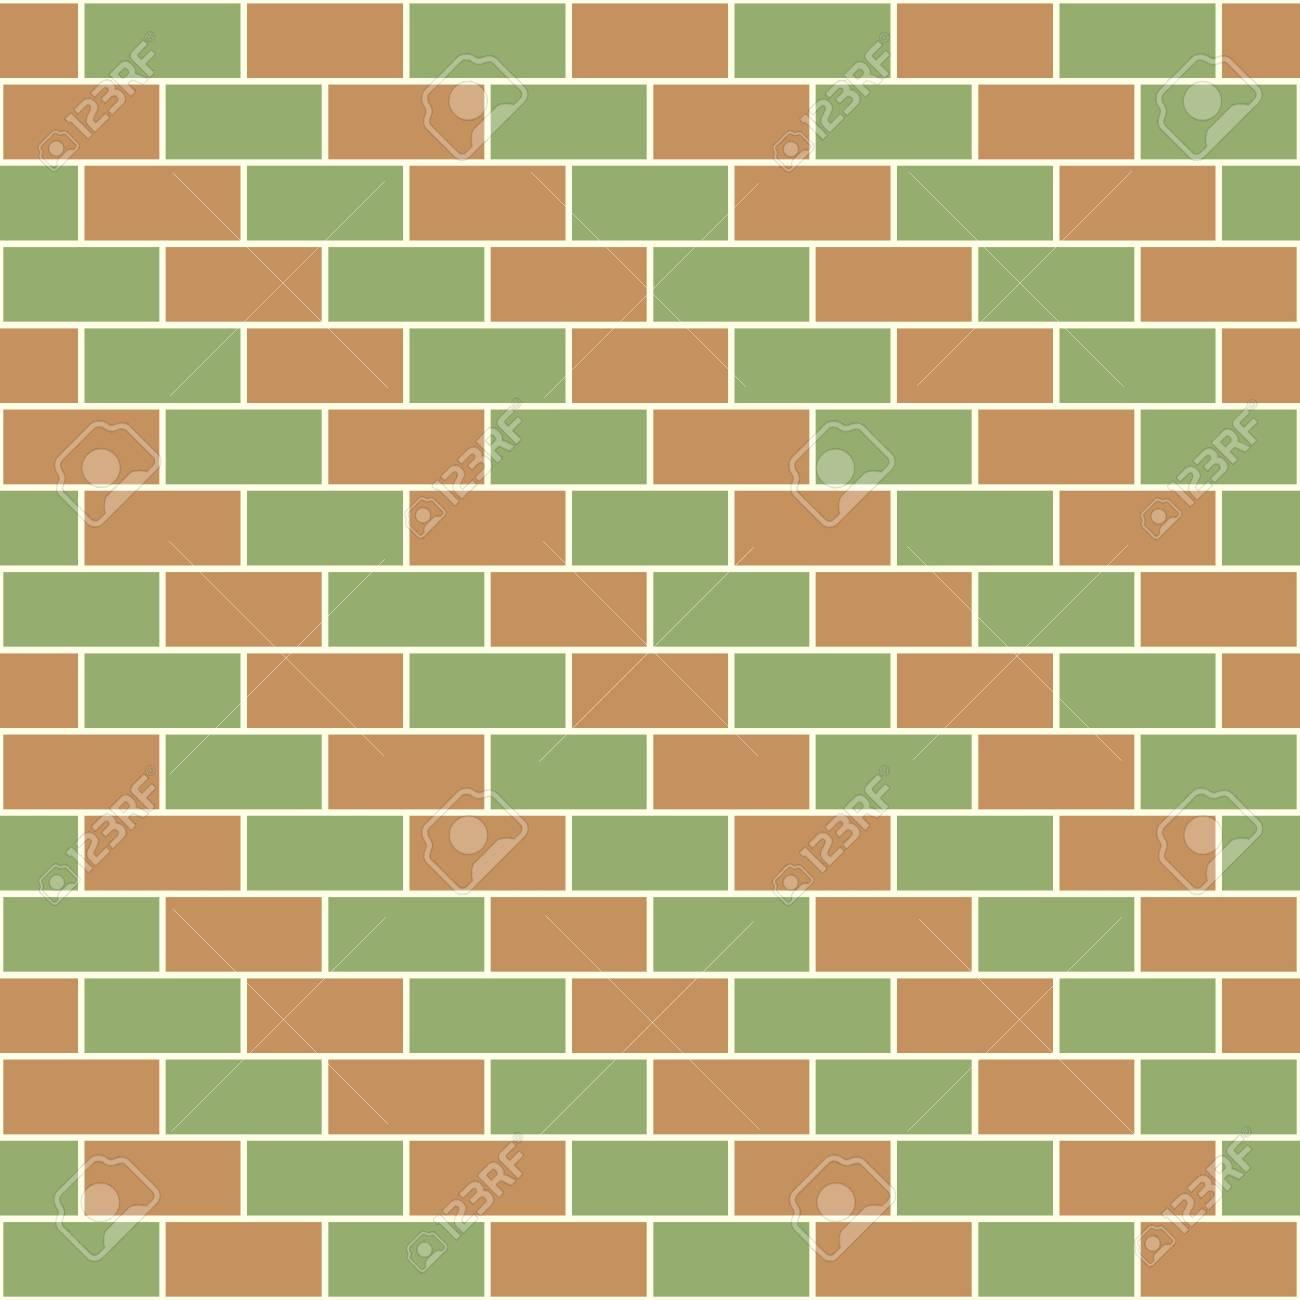 Bricks diagonal pattern red and green Stock Vector - 21026506